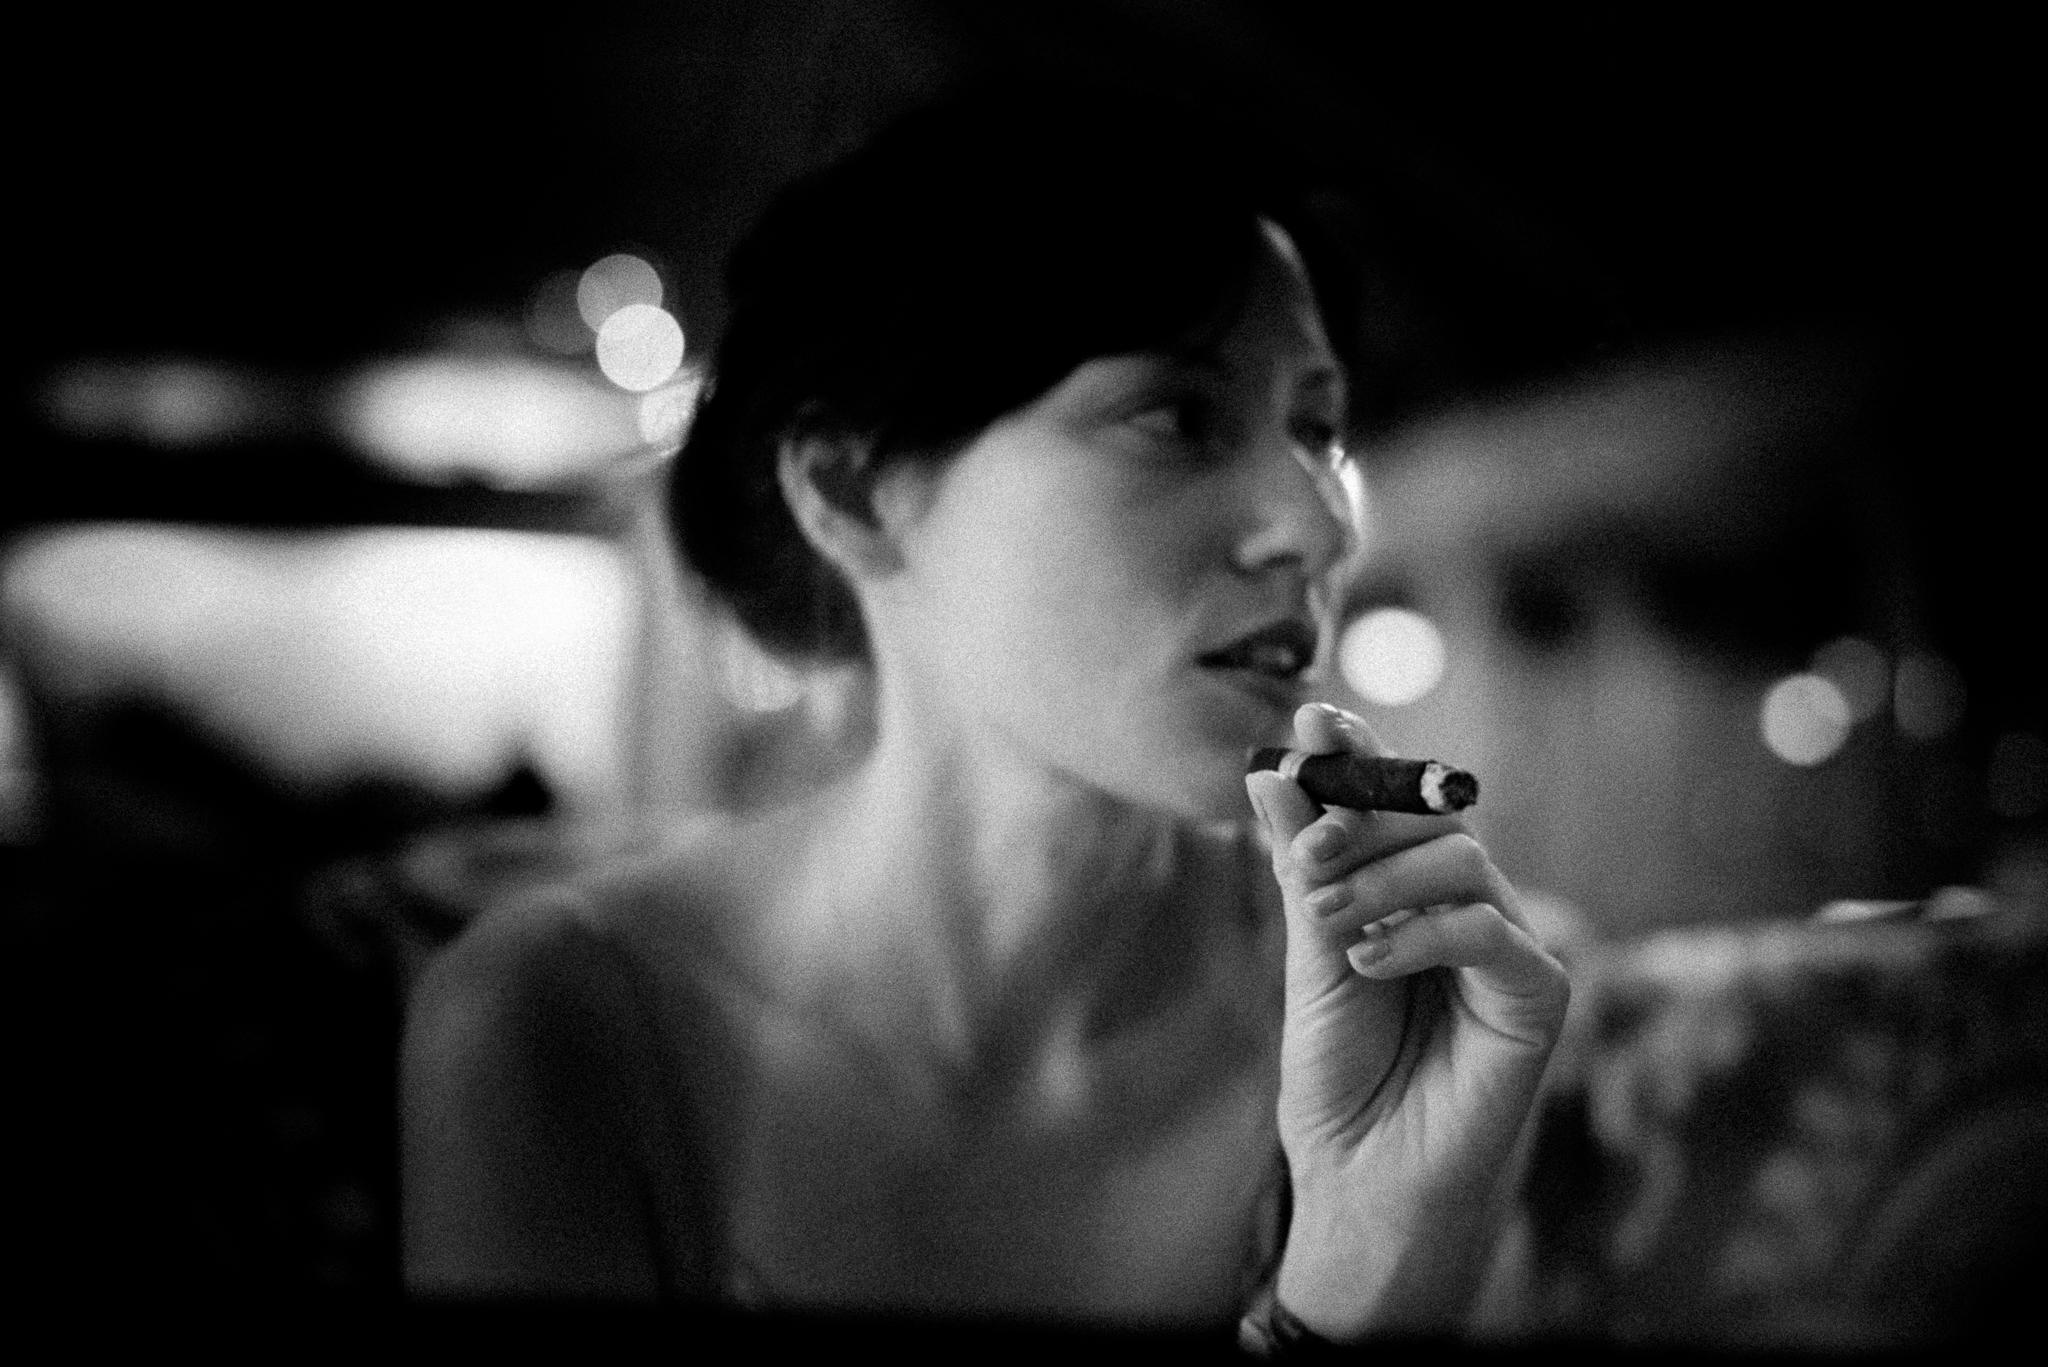 Cigar night in the lobby...